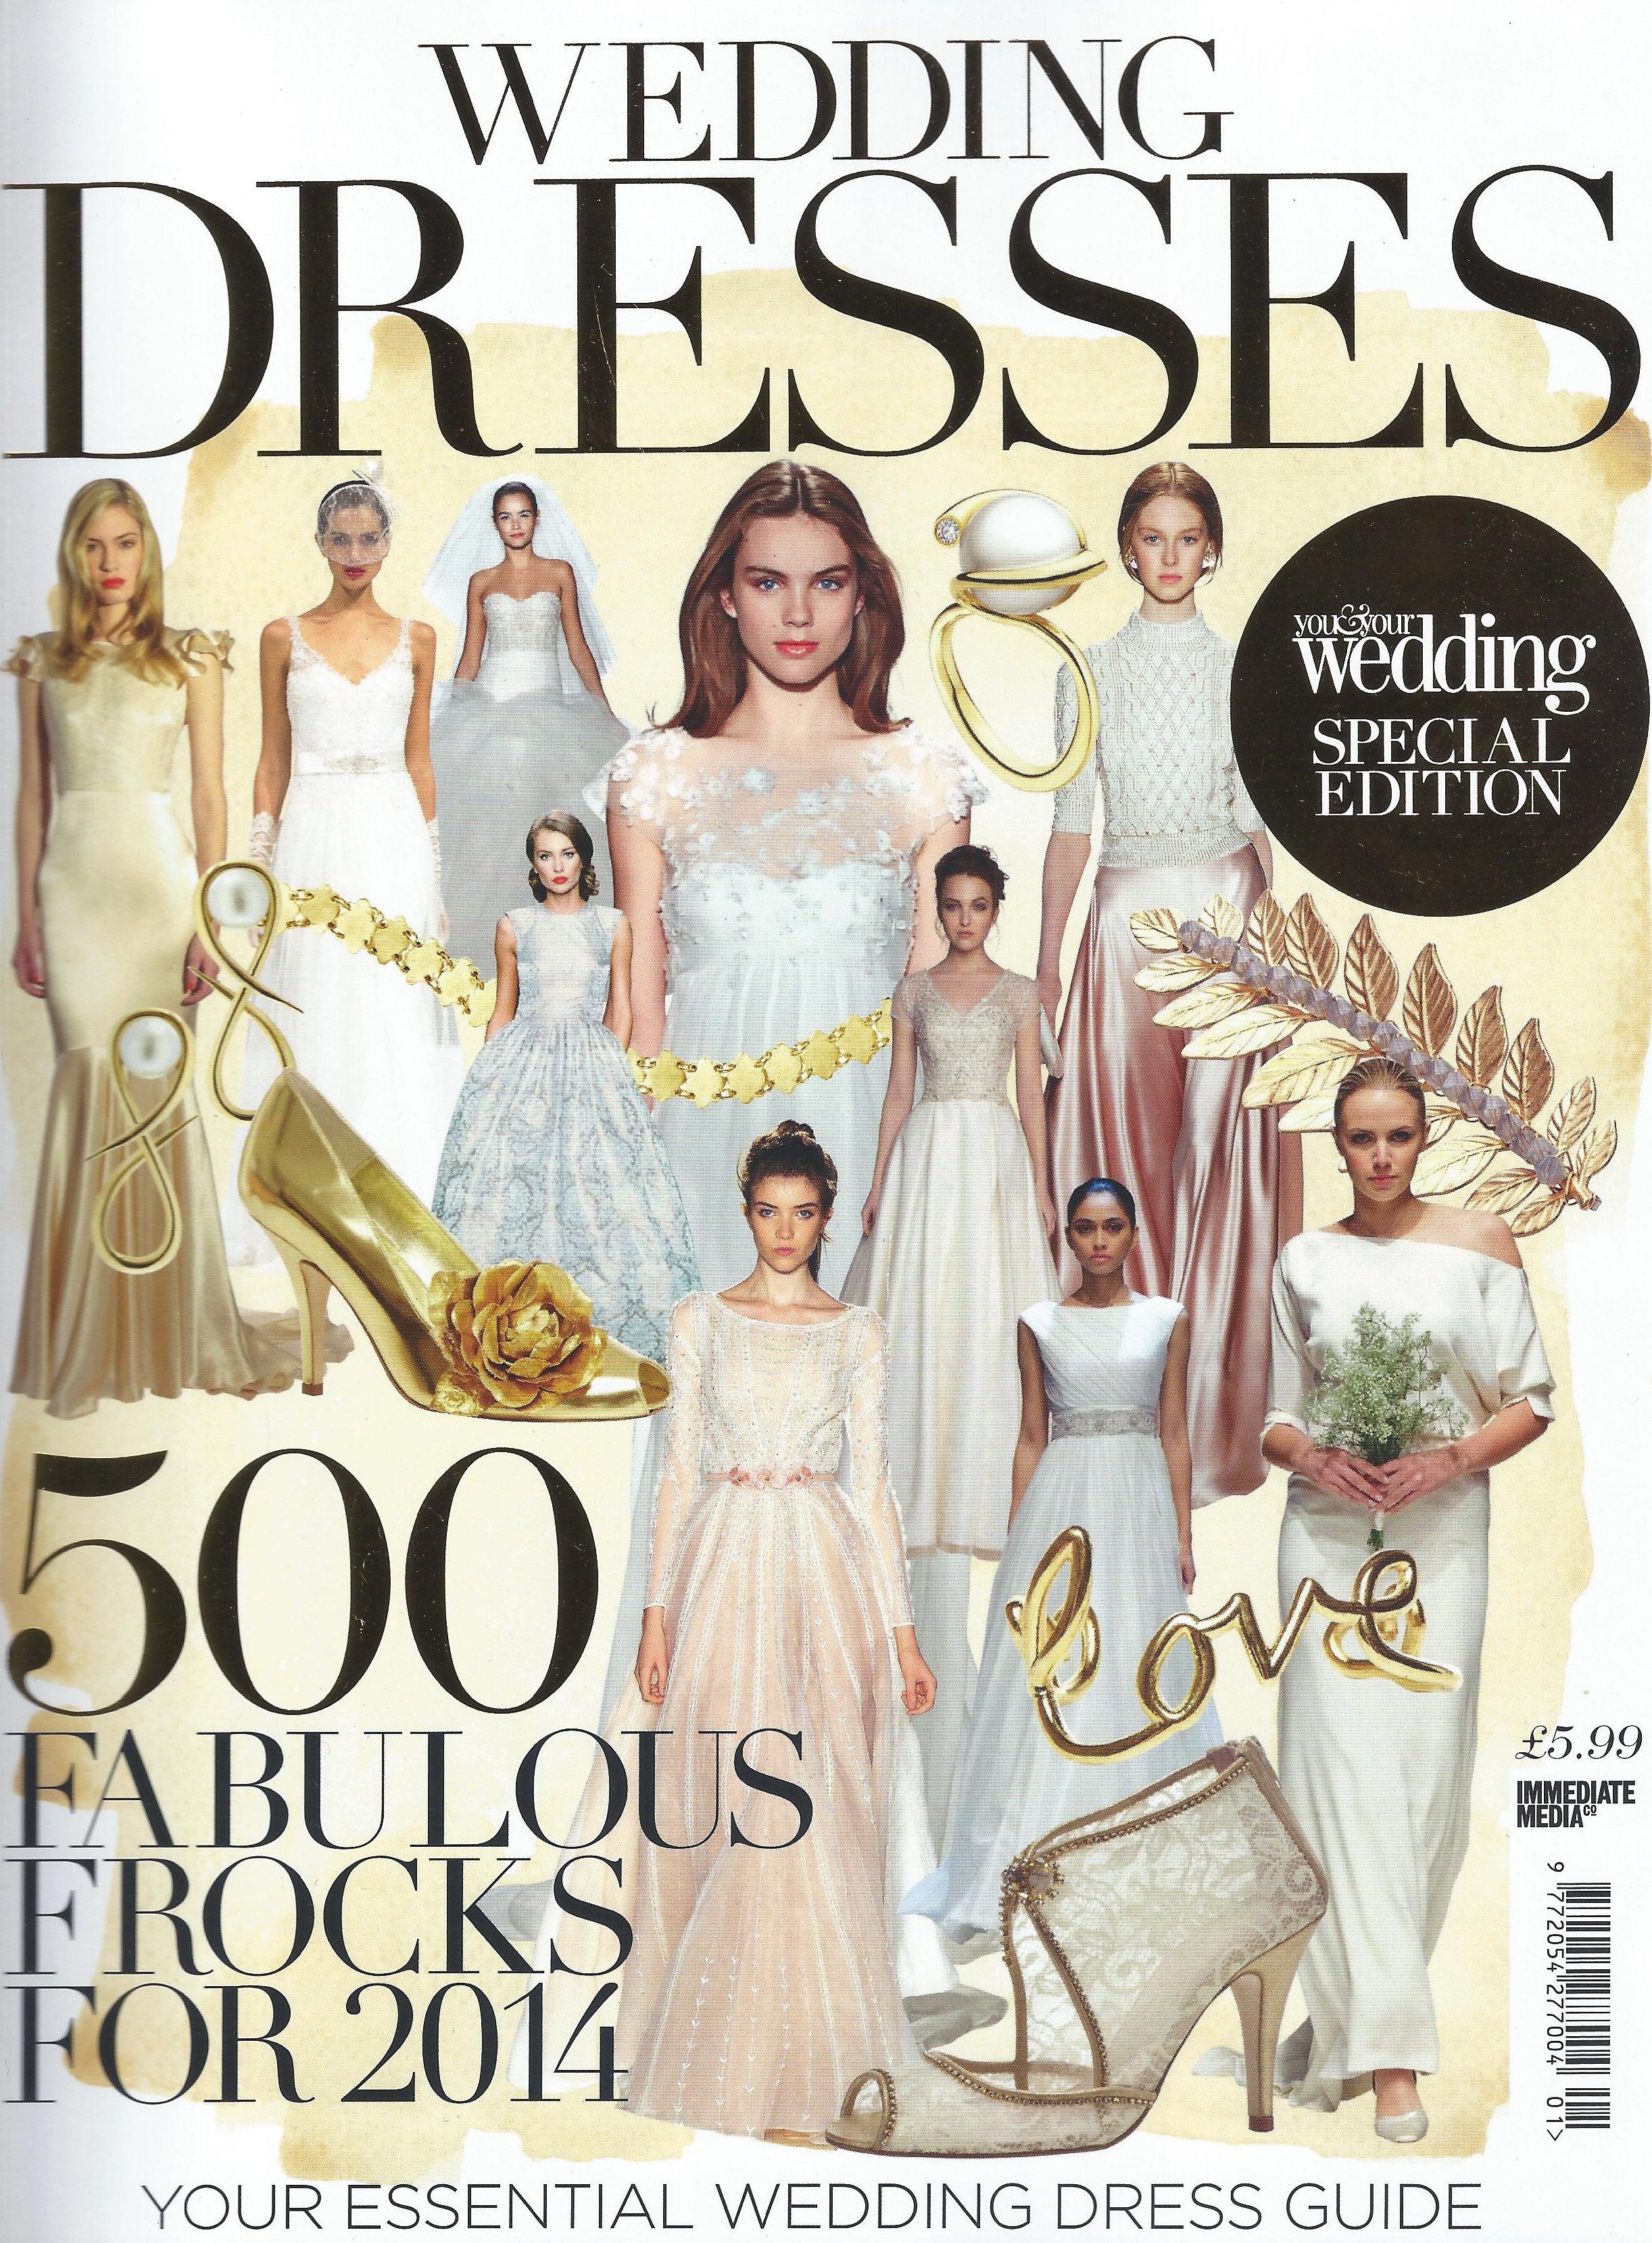 7A.THE DRESS.JPG